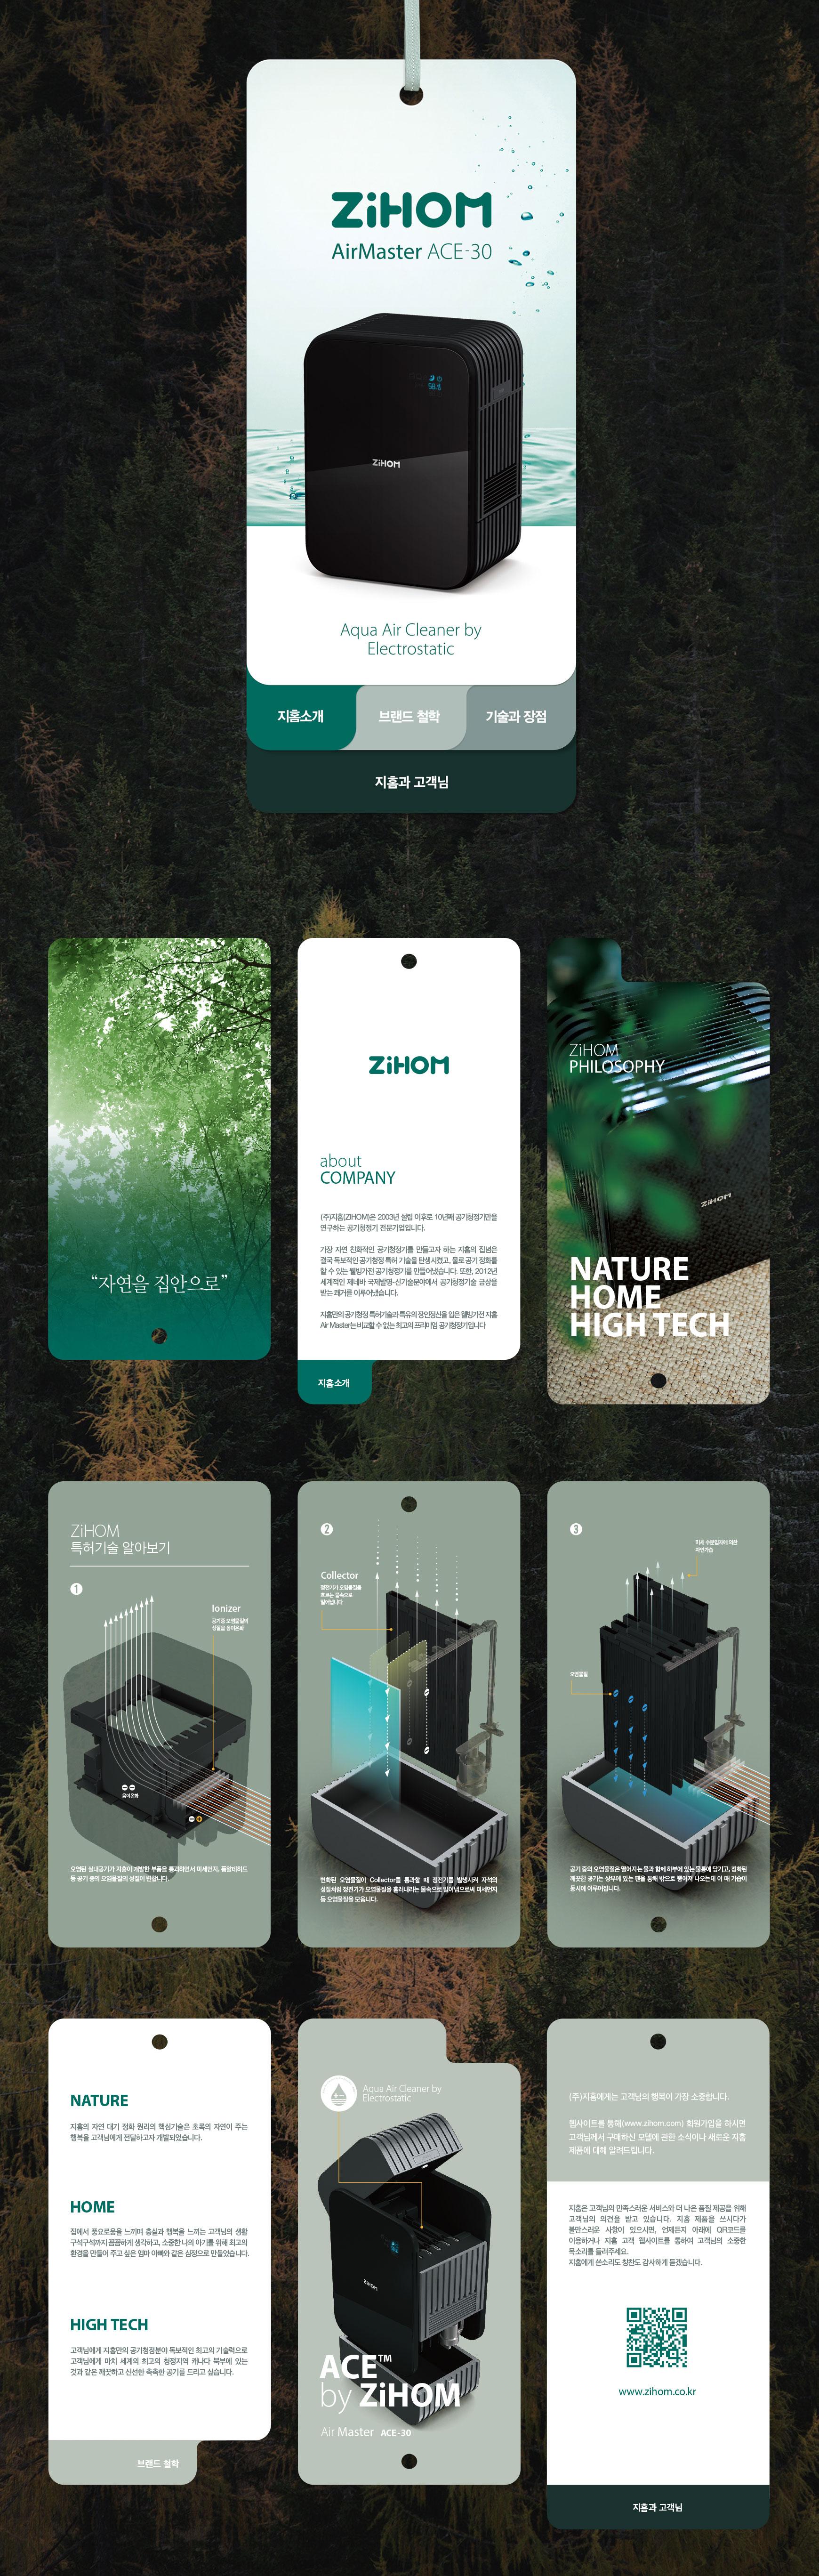 HSUXD - ZIHOM Brand Book